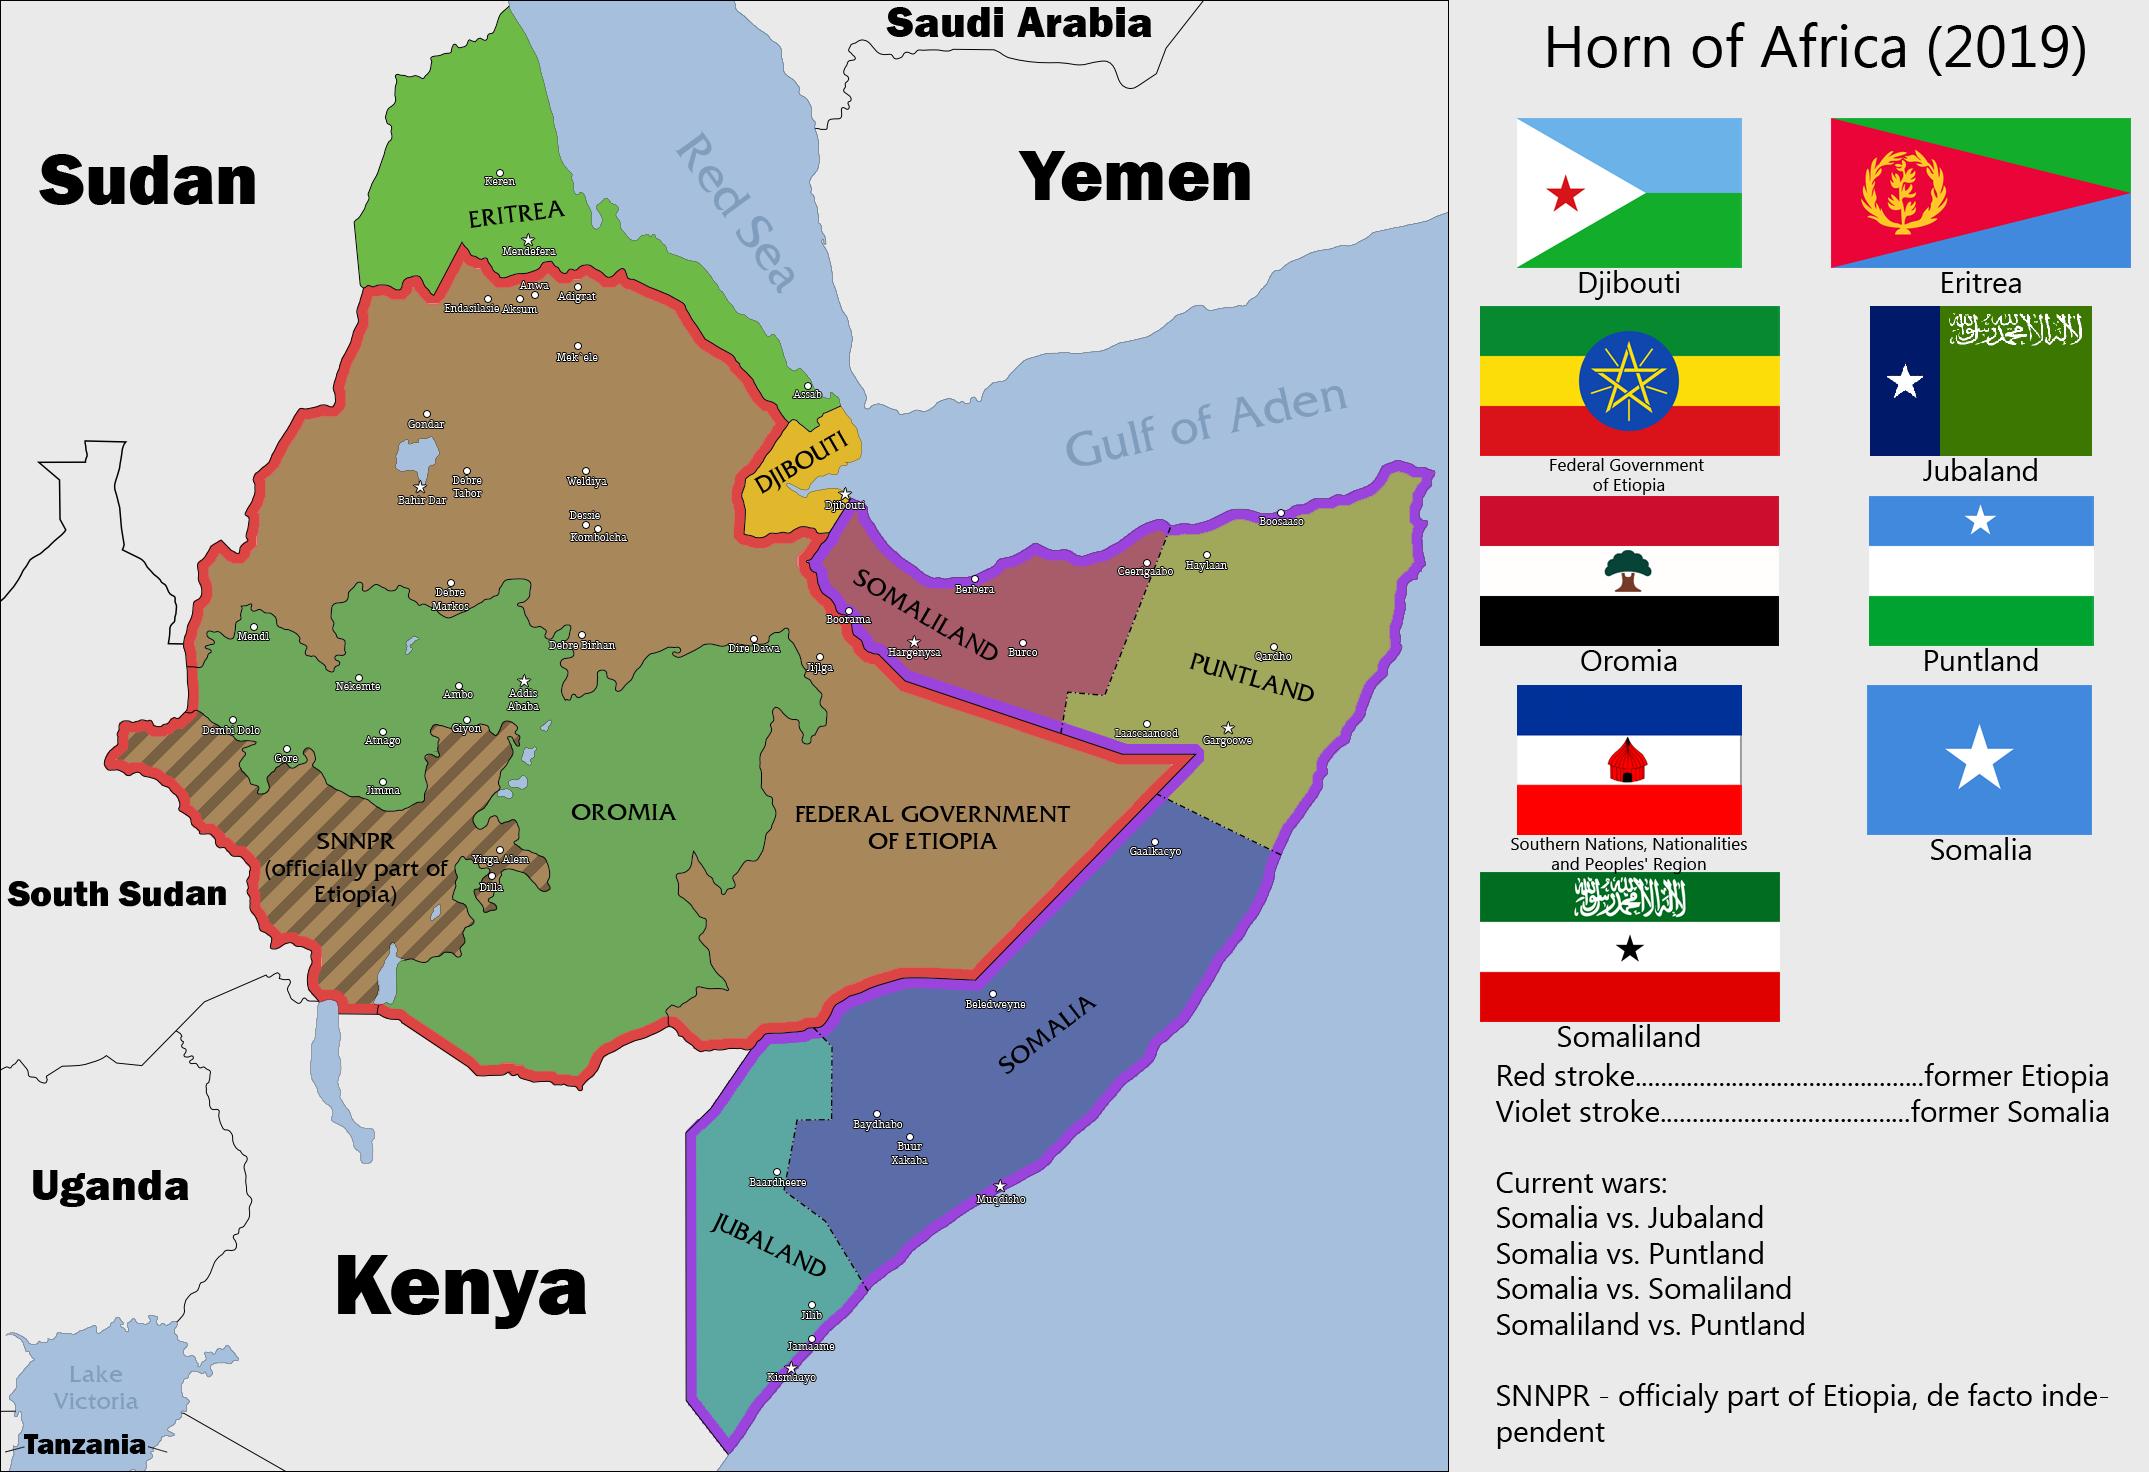 Horn Of Africa By Sevgart On DeviantArt - Horn of africa map